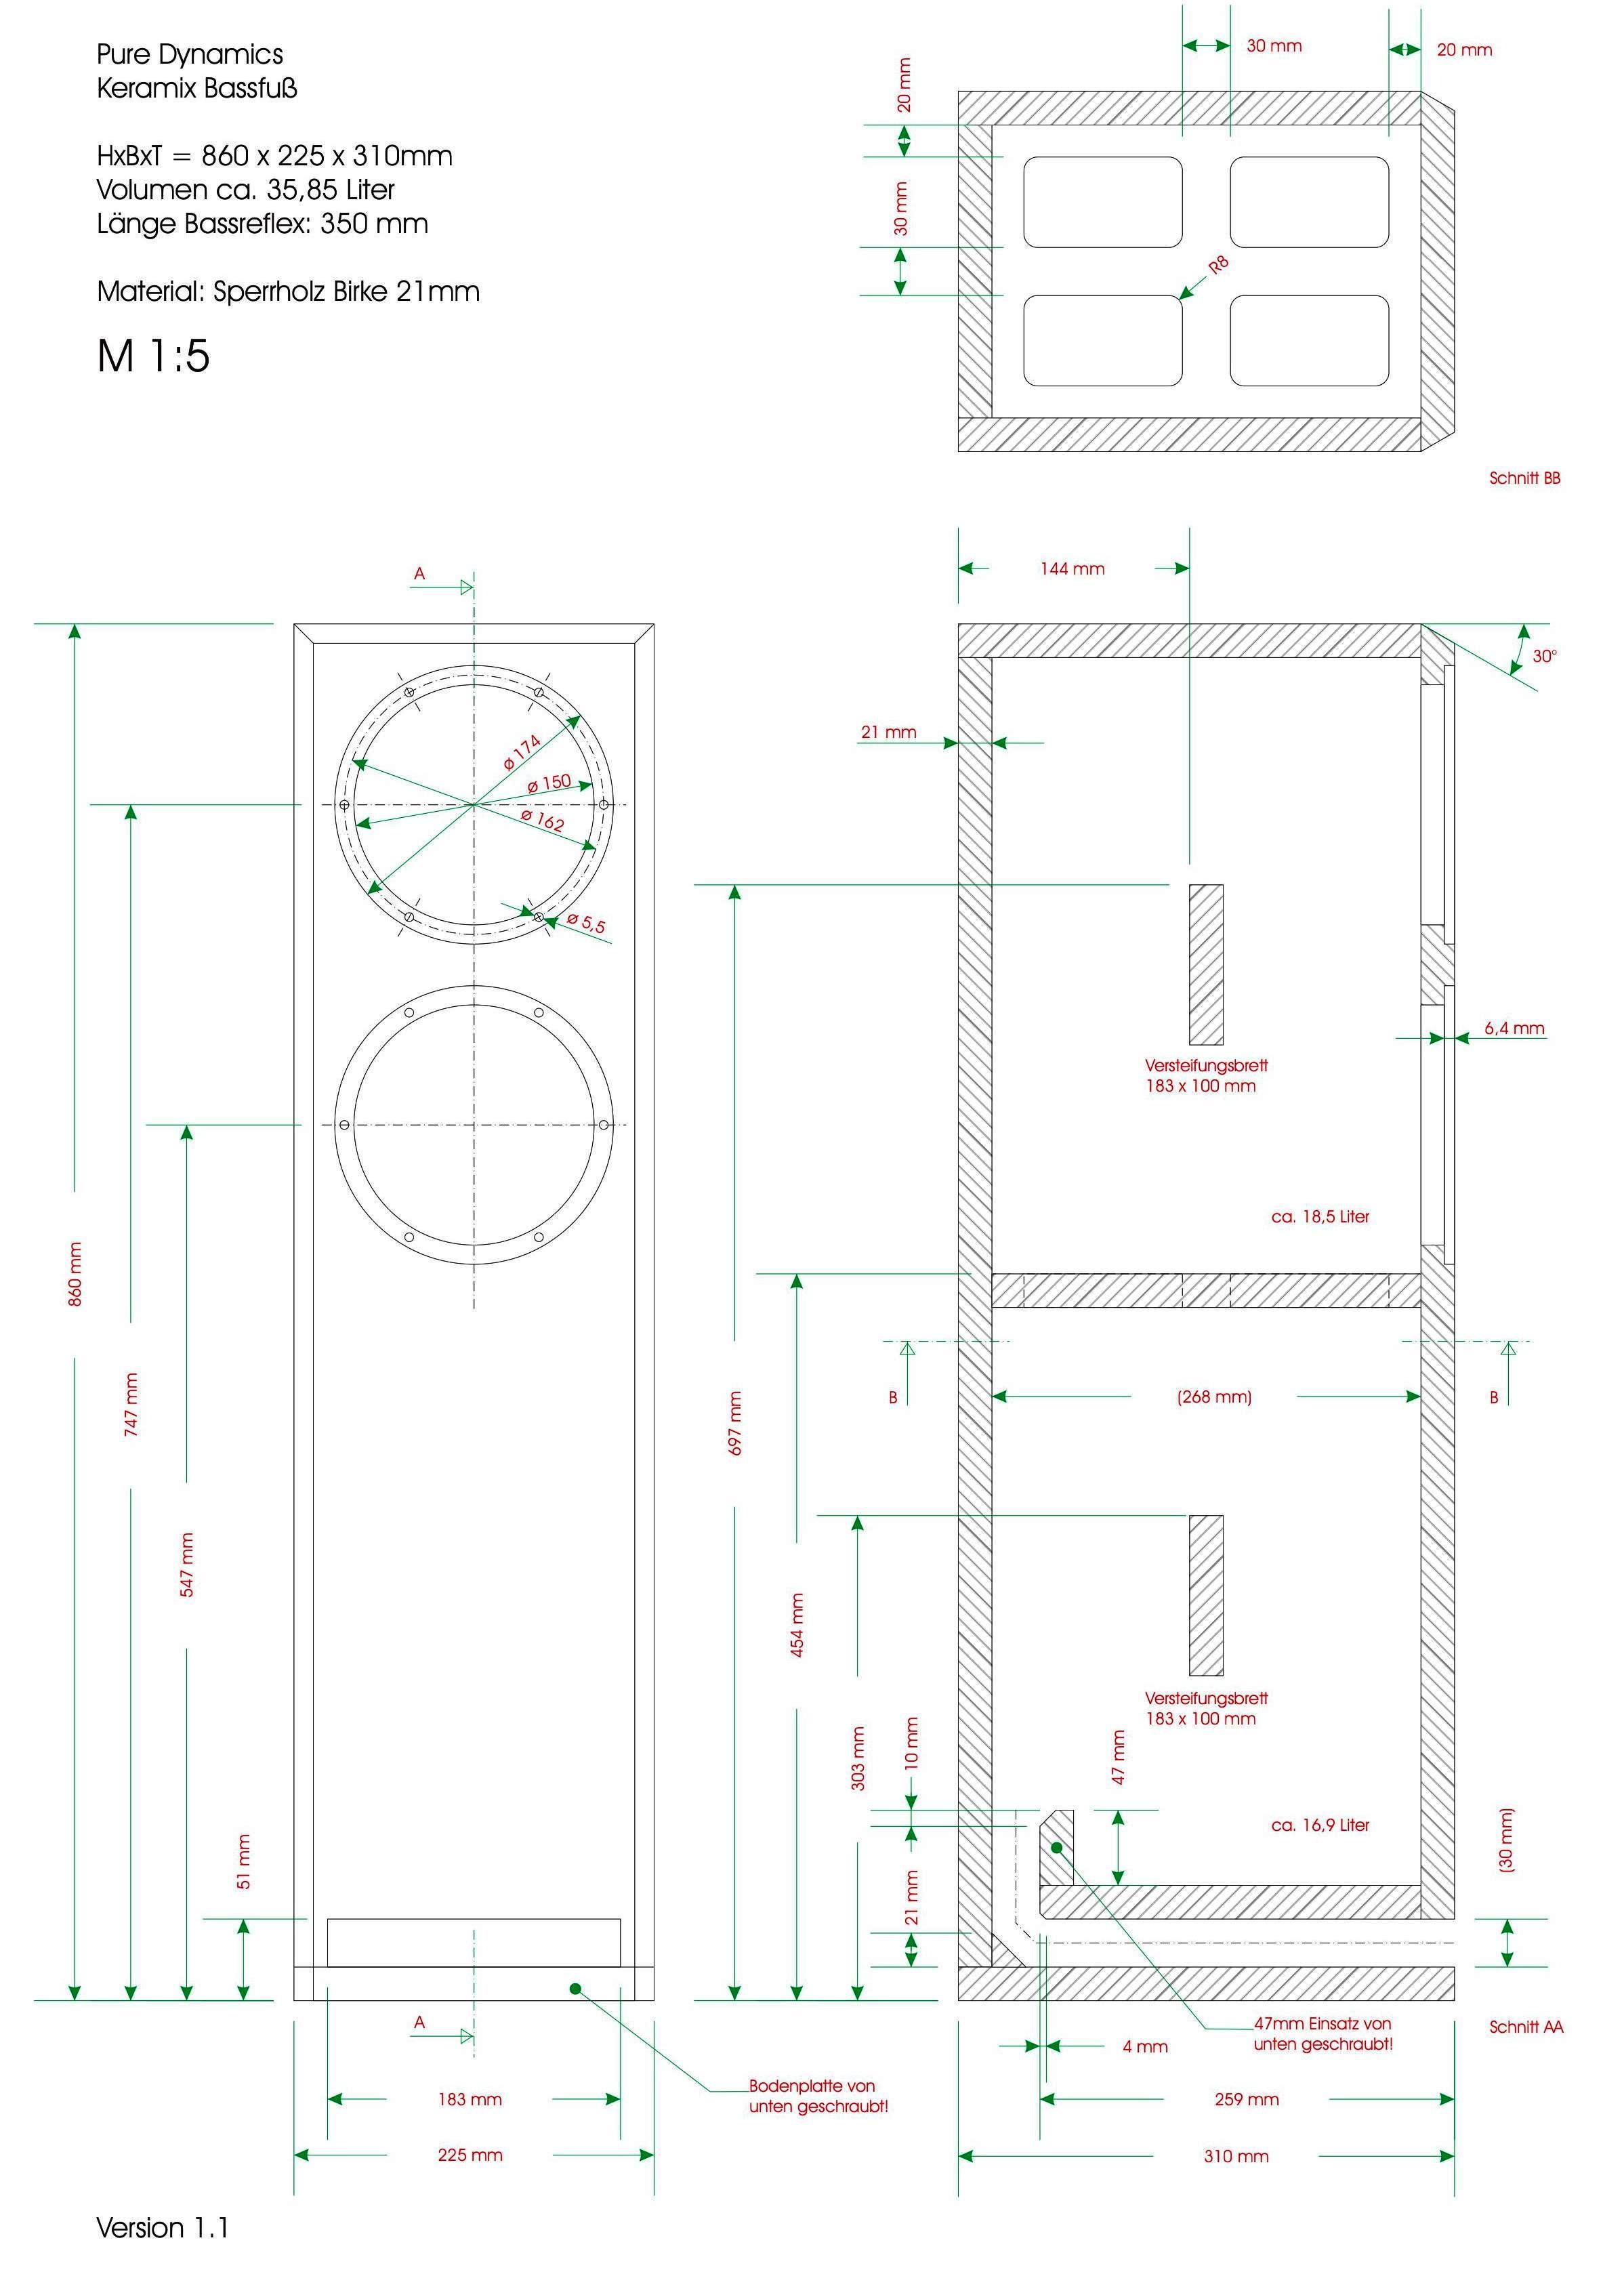 lautsprecherbau thomaier - pure dynamics keramix3 auf gehrung